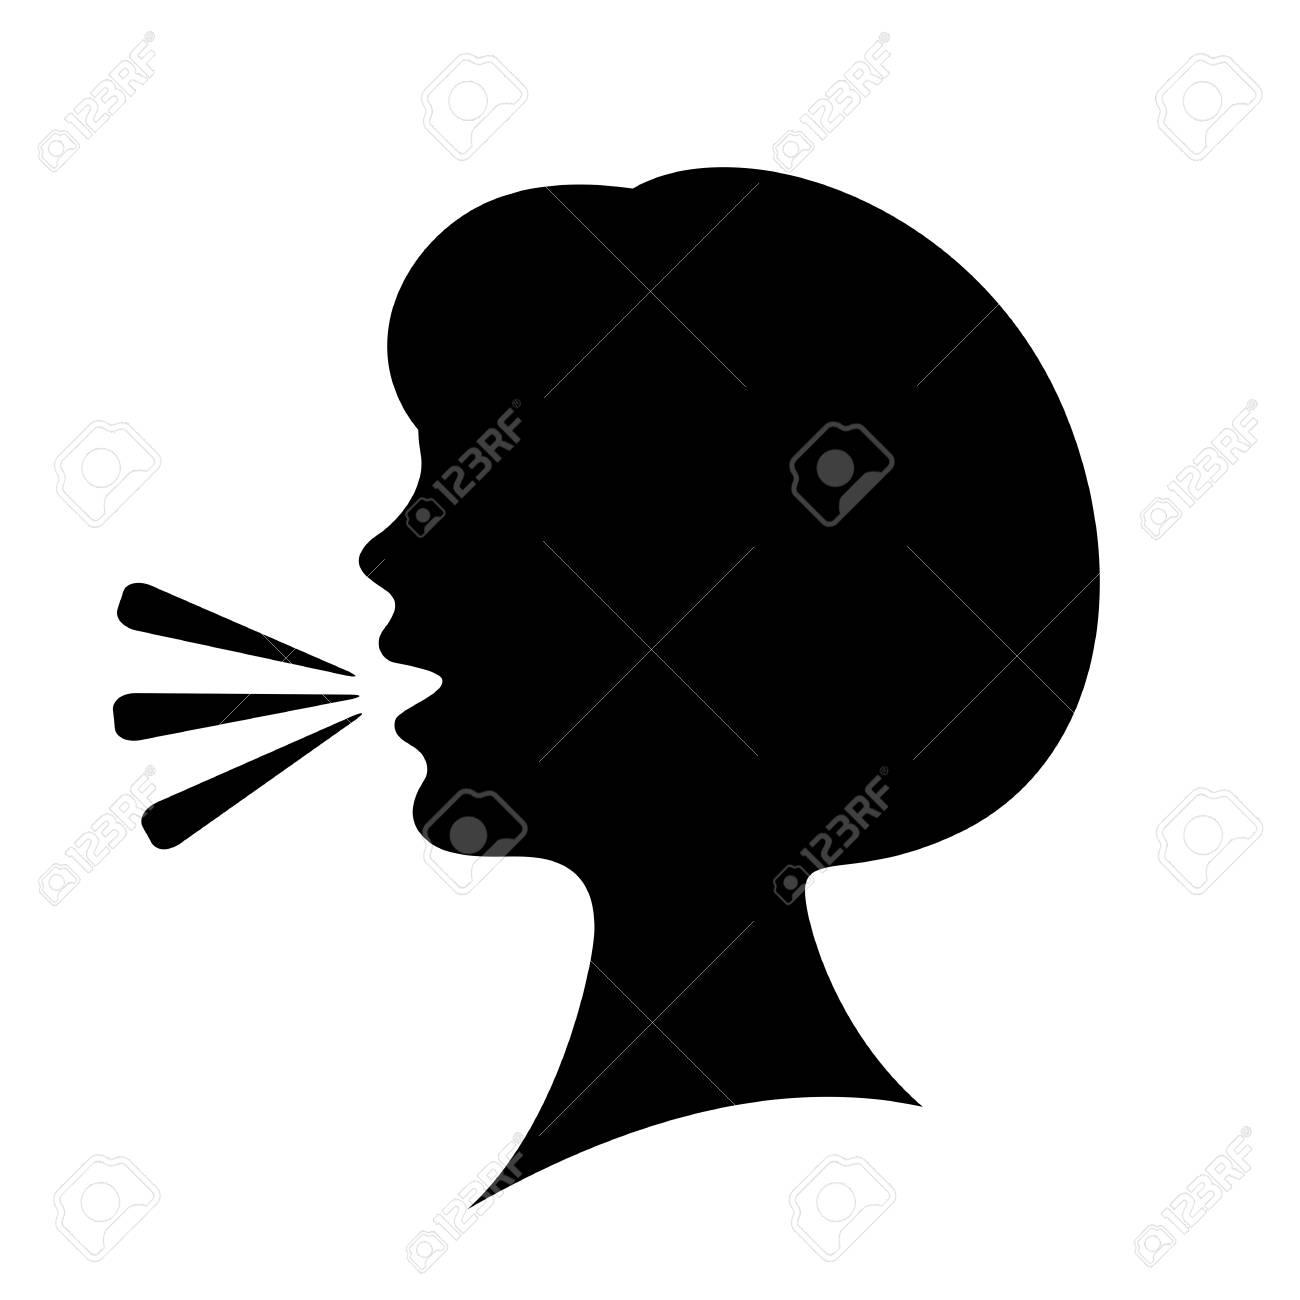 Speaking woman silhouette icon - 105106426